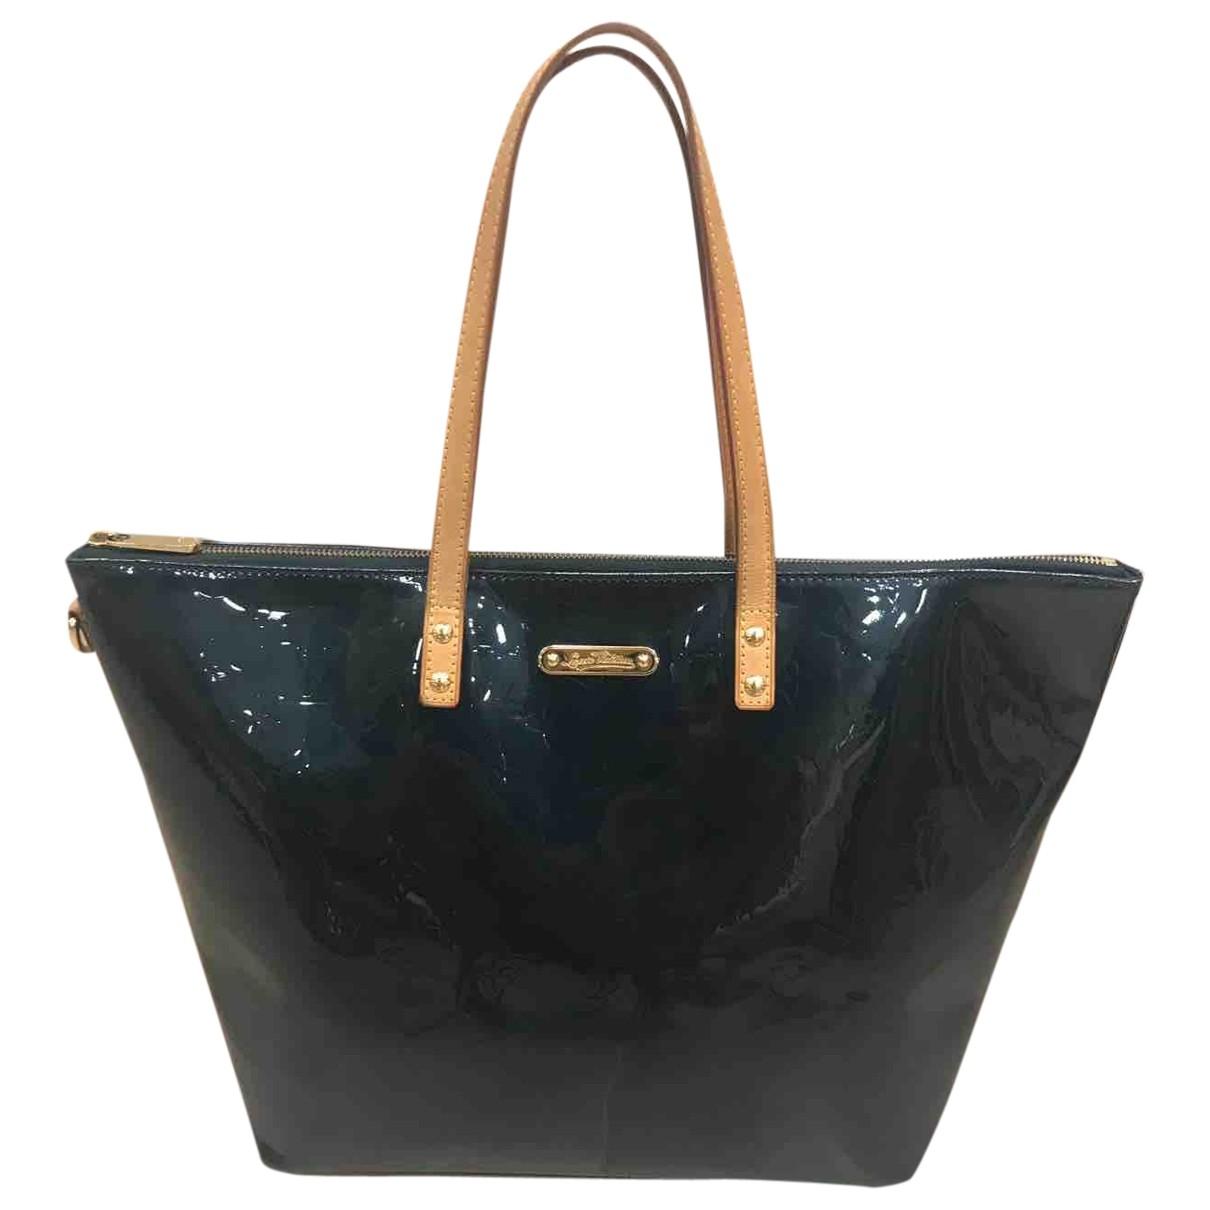 Louis Vuitton \N Green Leather handbag for Women \N